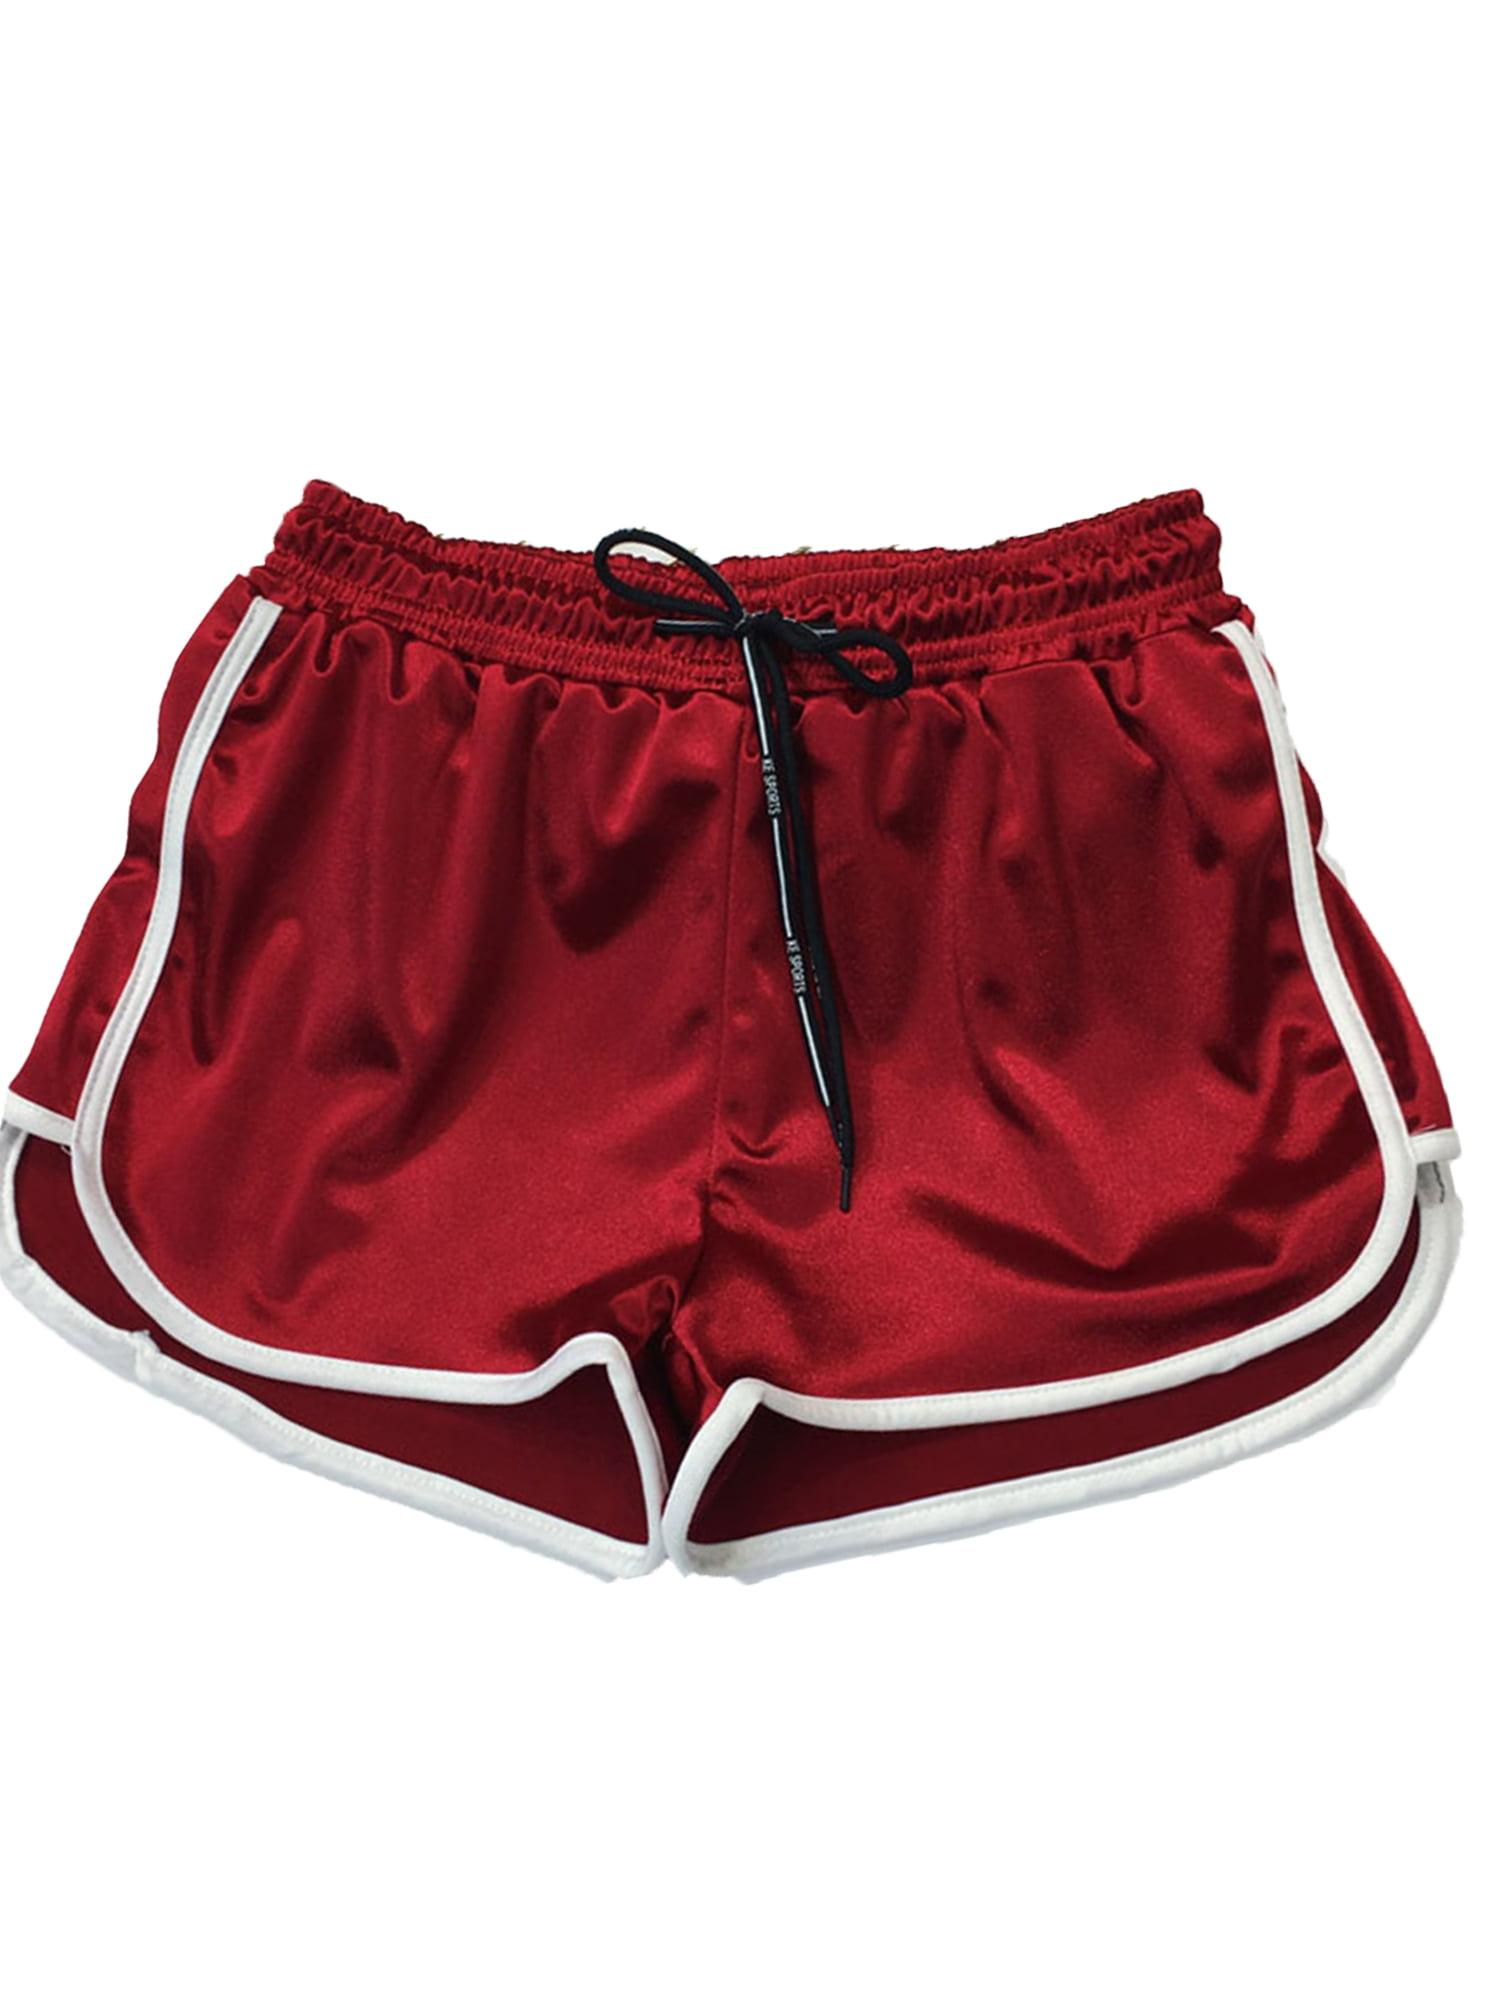 Women/'s Lady Summer Causal Gym Yoga Running Shorts Beach Sports Plus Size Pants